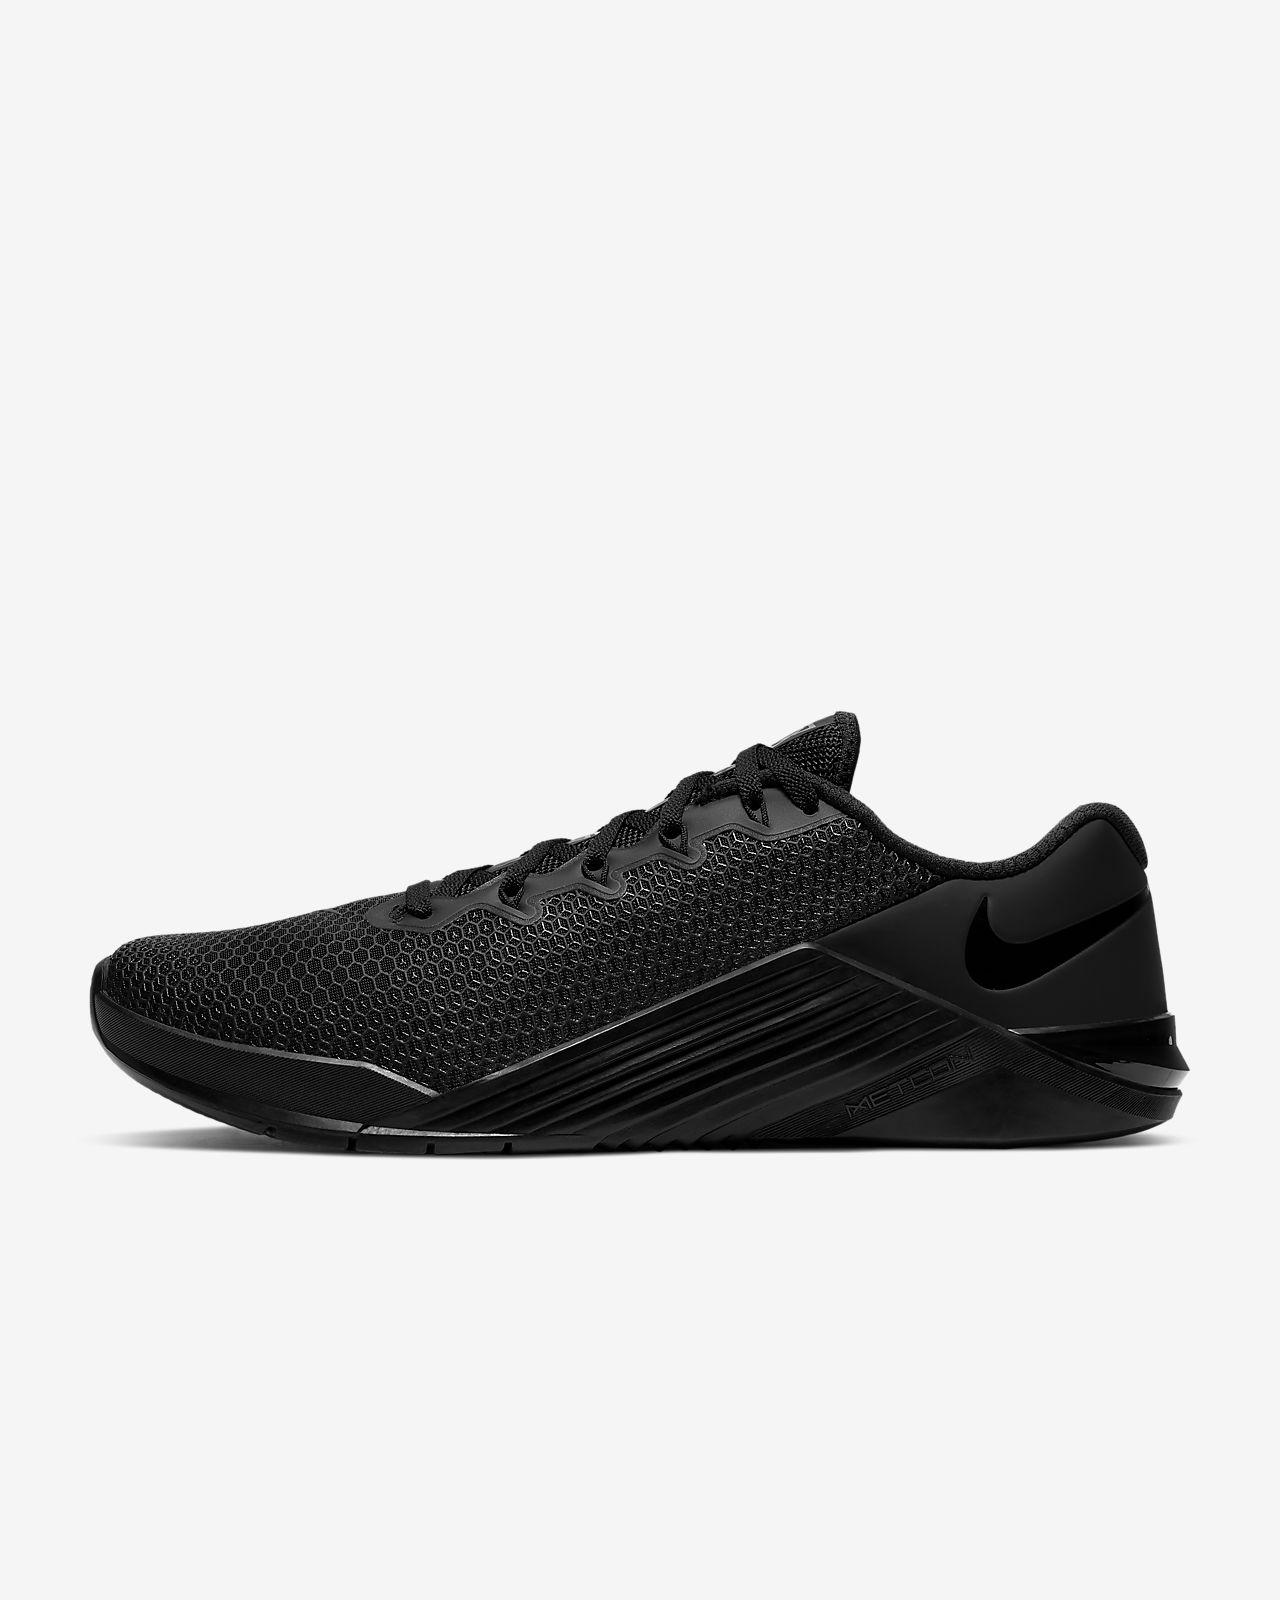 Herren Nike Nike Metcon Metcon Nike Metcon Herren 5 Herren Trainingsschuh Trainingsschuh 5 5 reWdBoCx